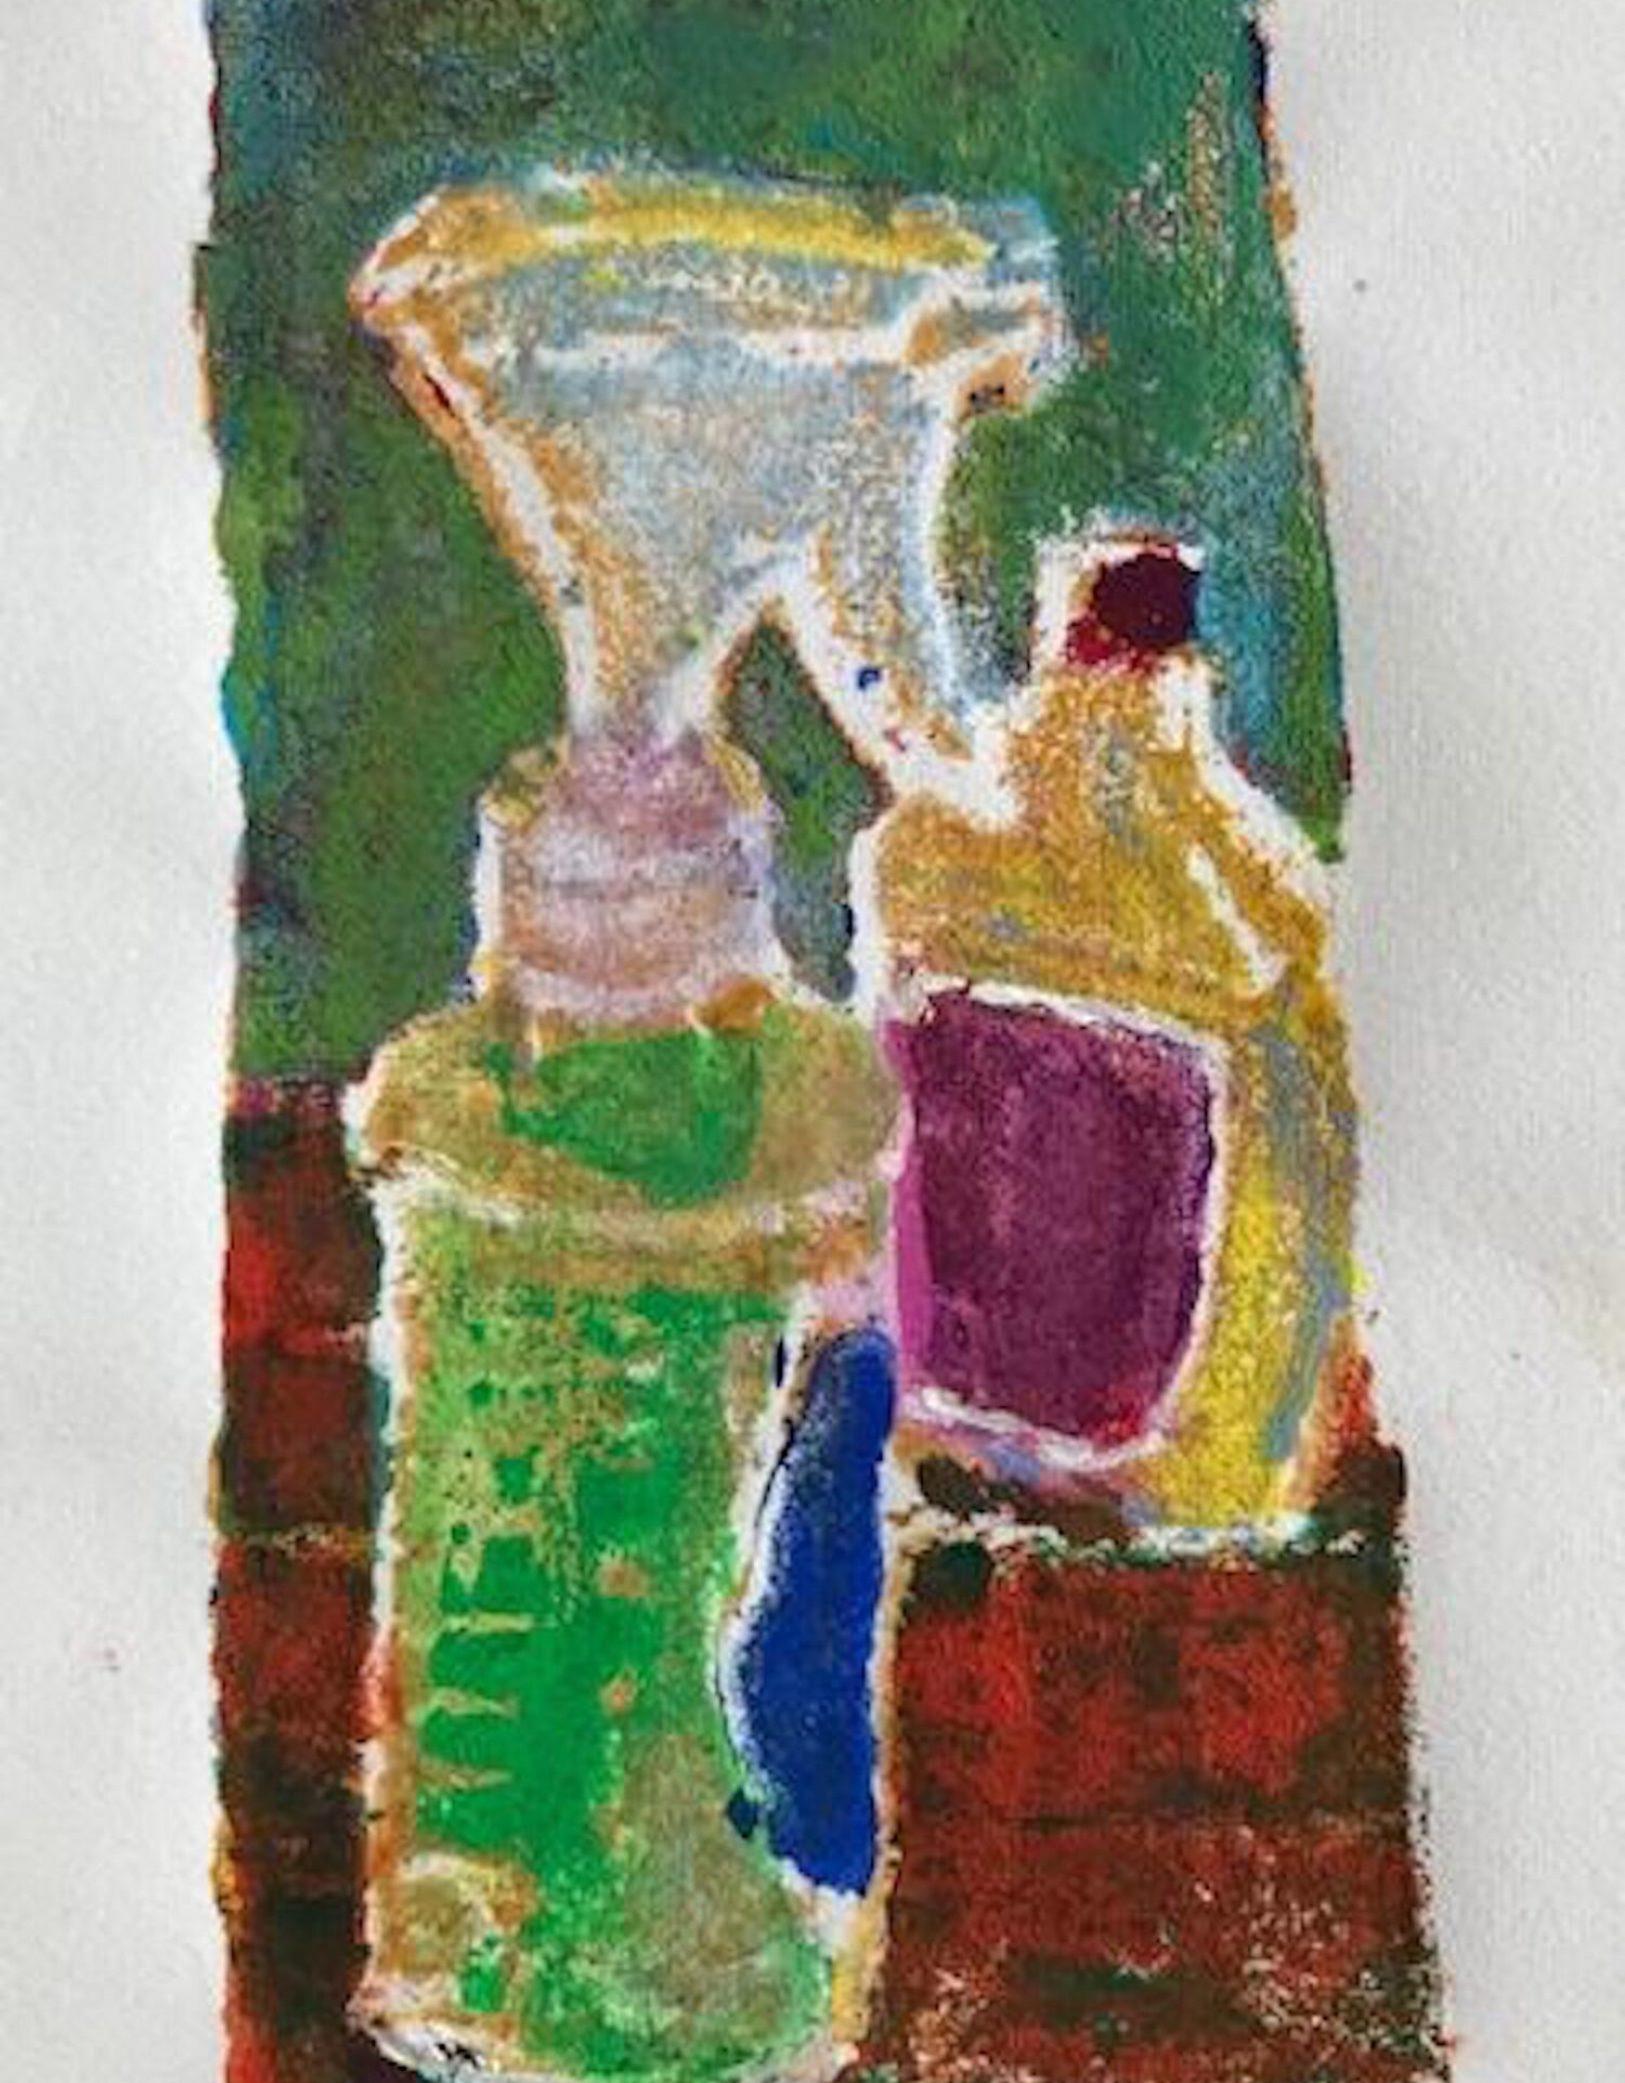 Studio Bottles, Soft Block Print, 4 .75